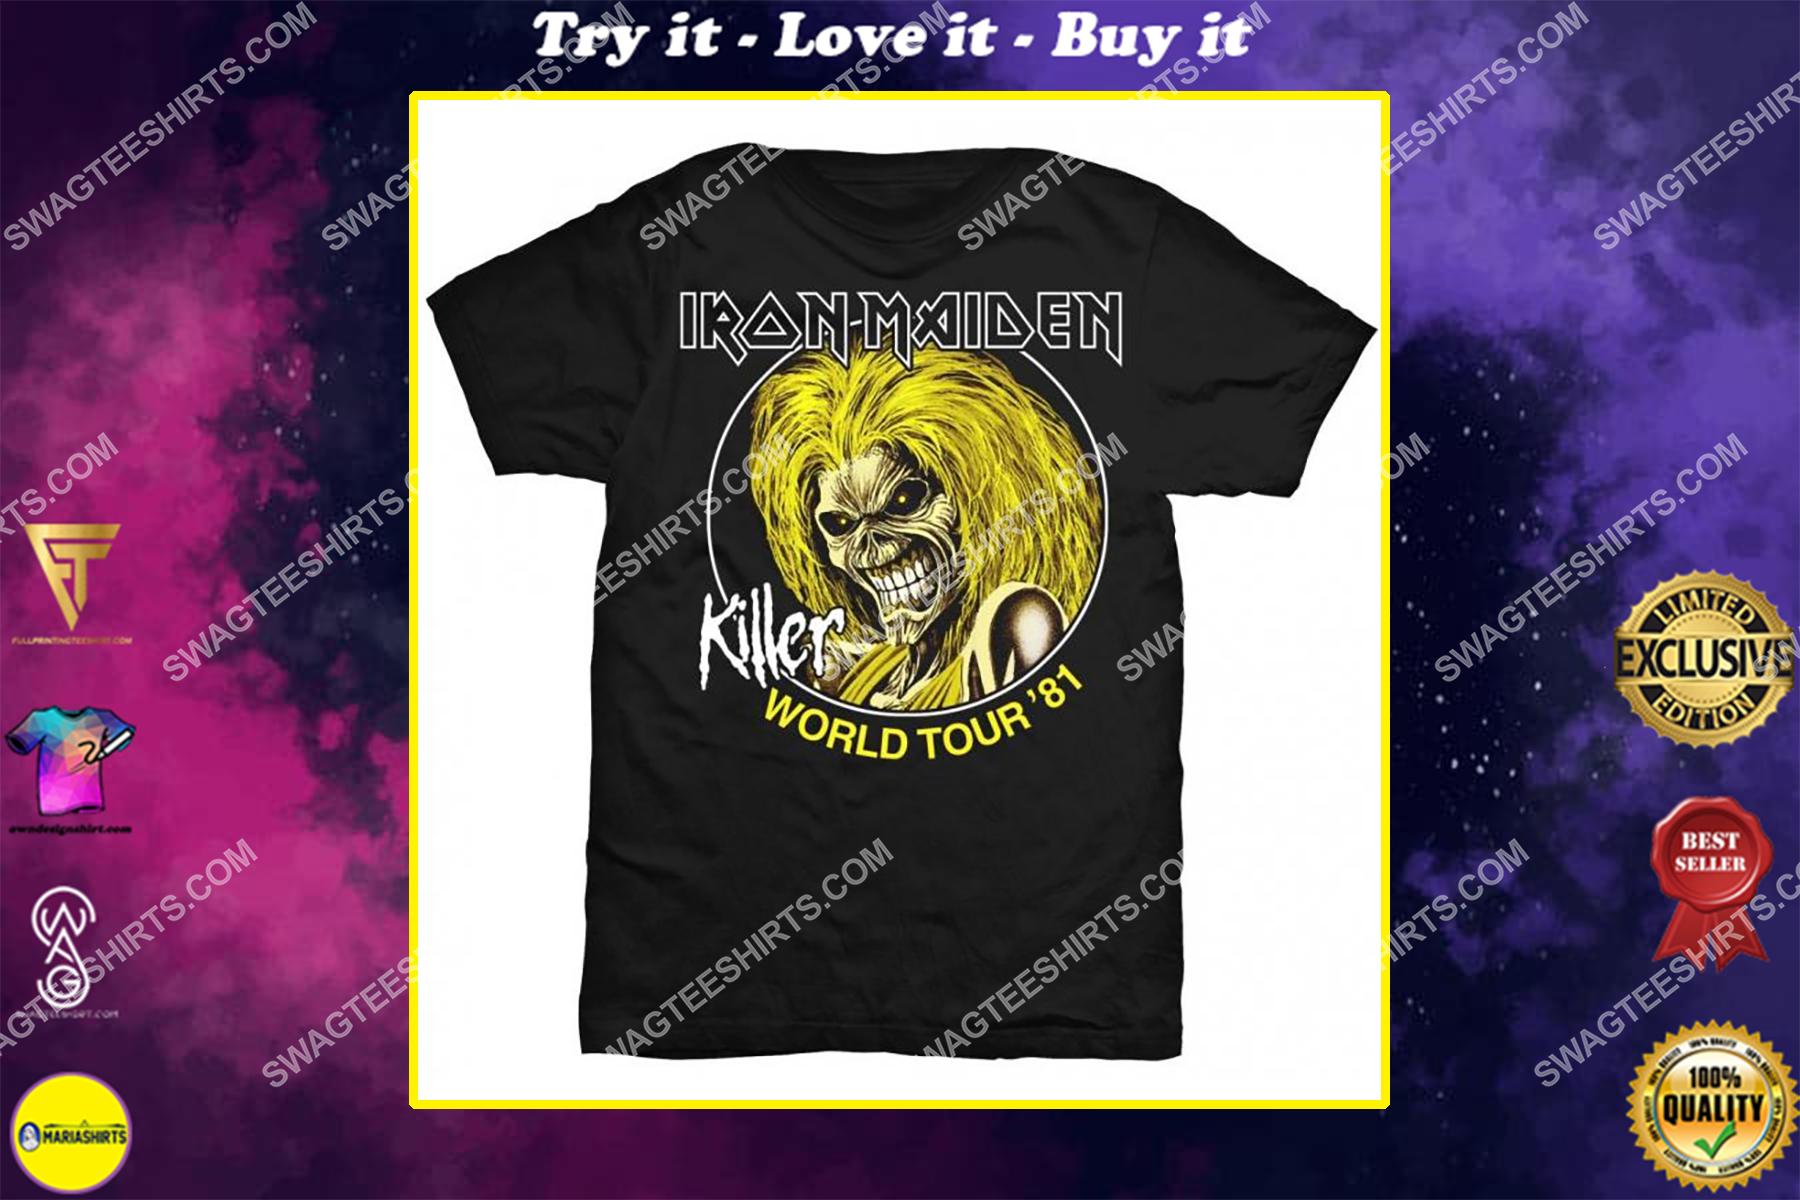 the iron maiden rock band killers world tour 81 shirt